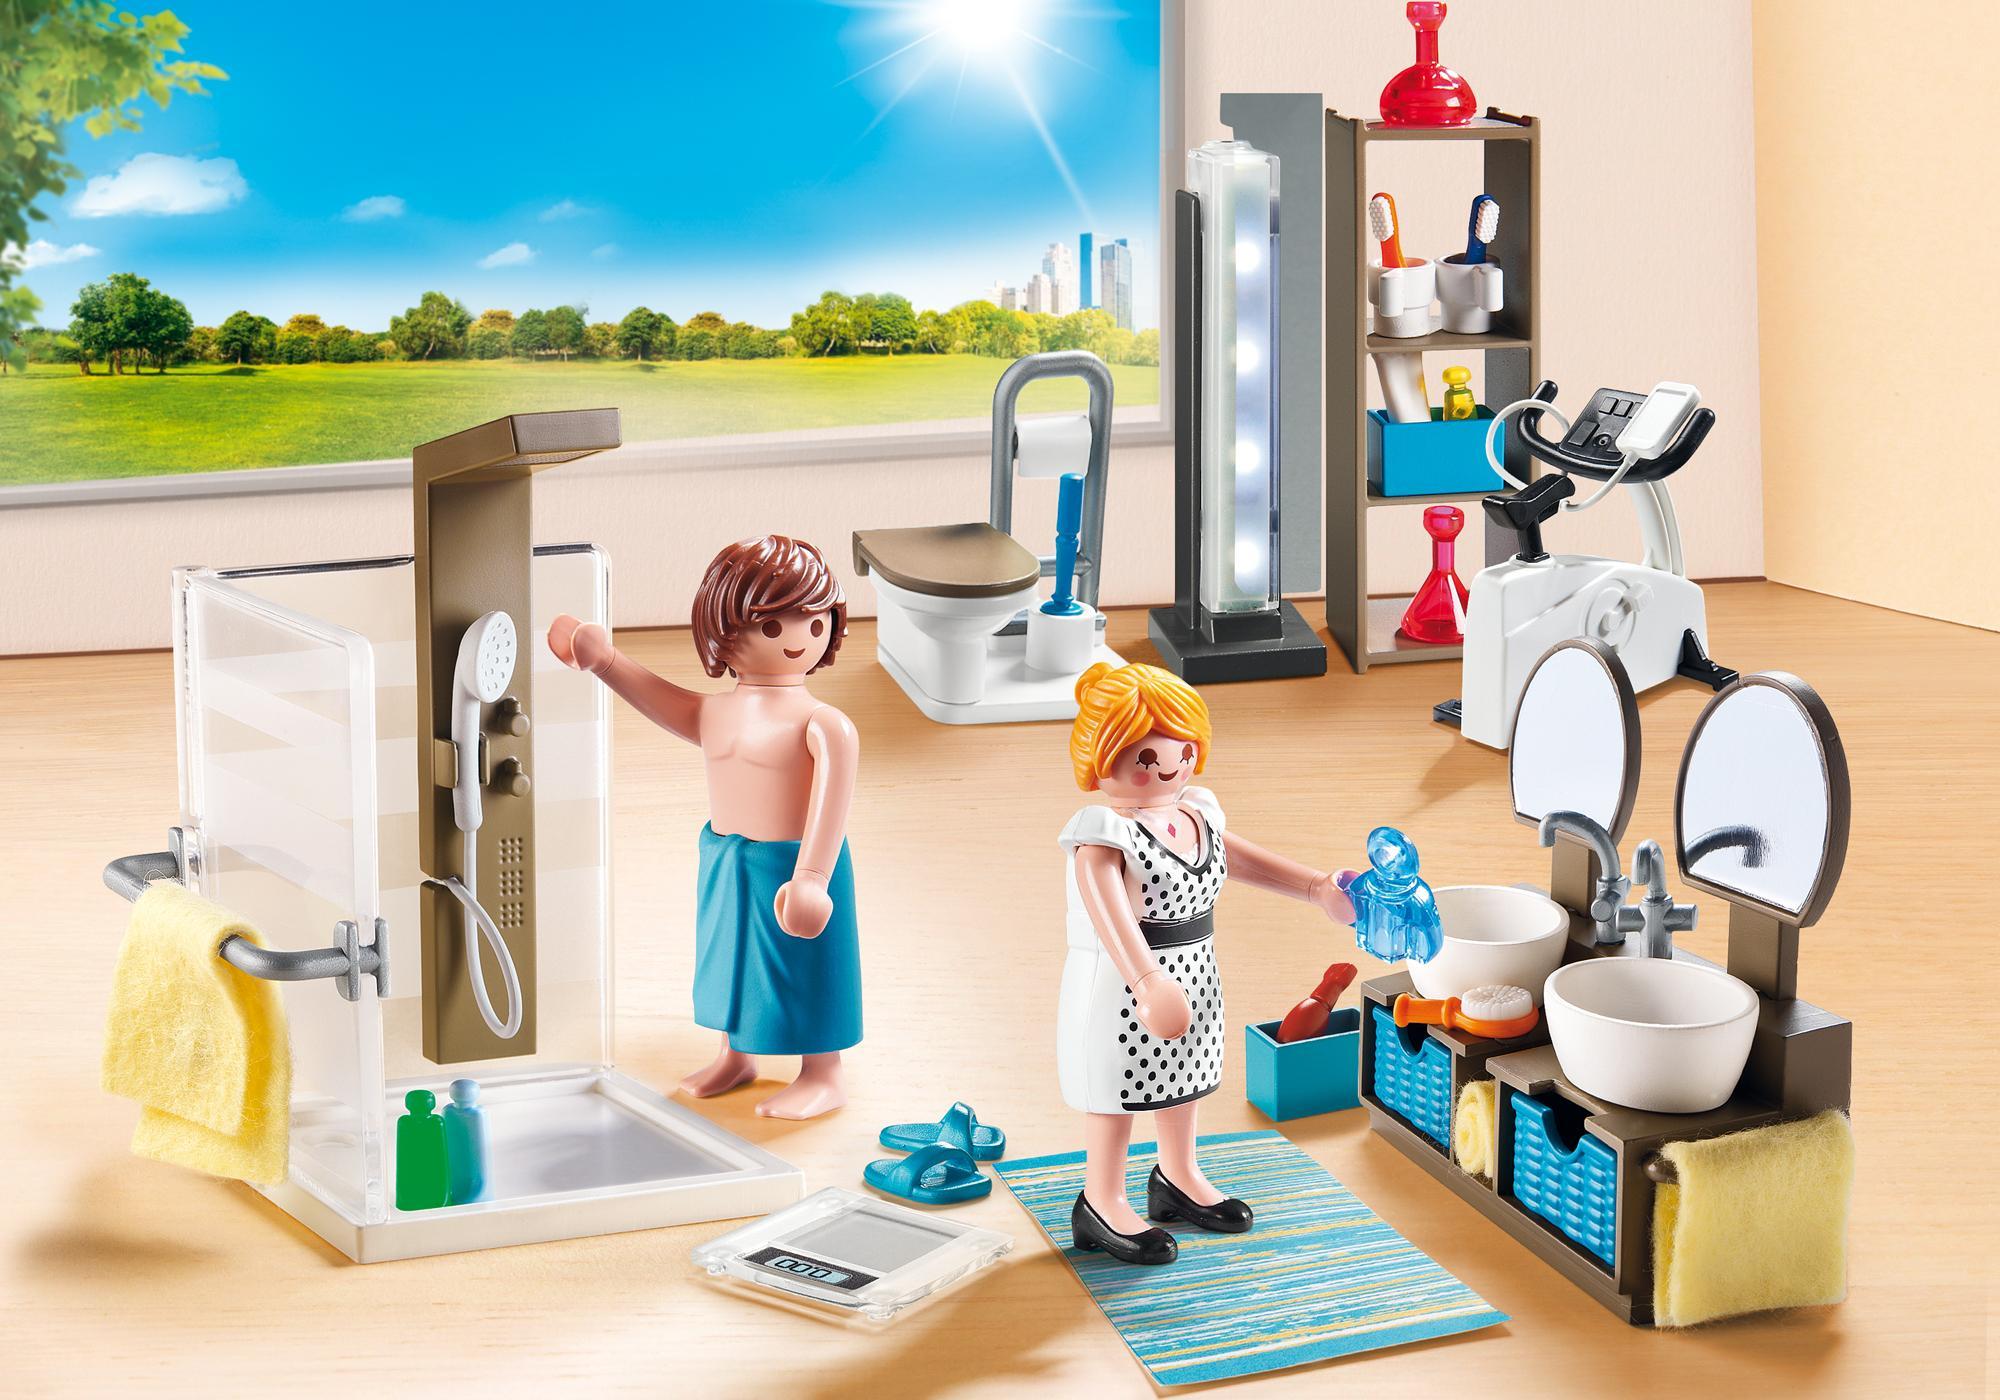 http://media.playmobil.com/i/playmobil/9268_product_detail/Badkamer met douche